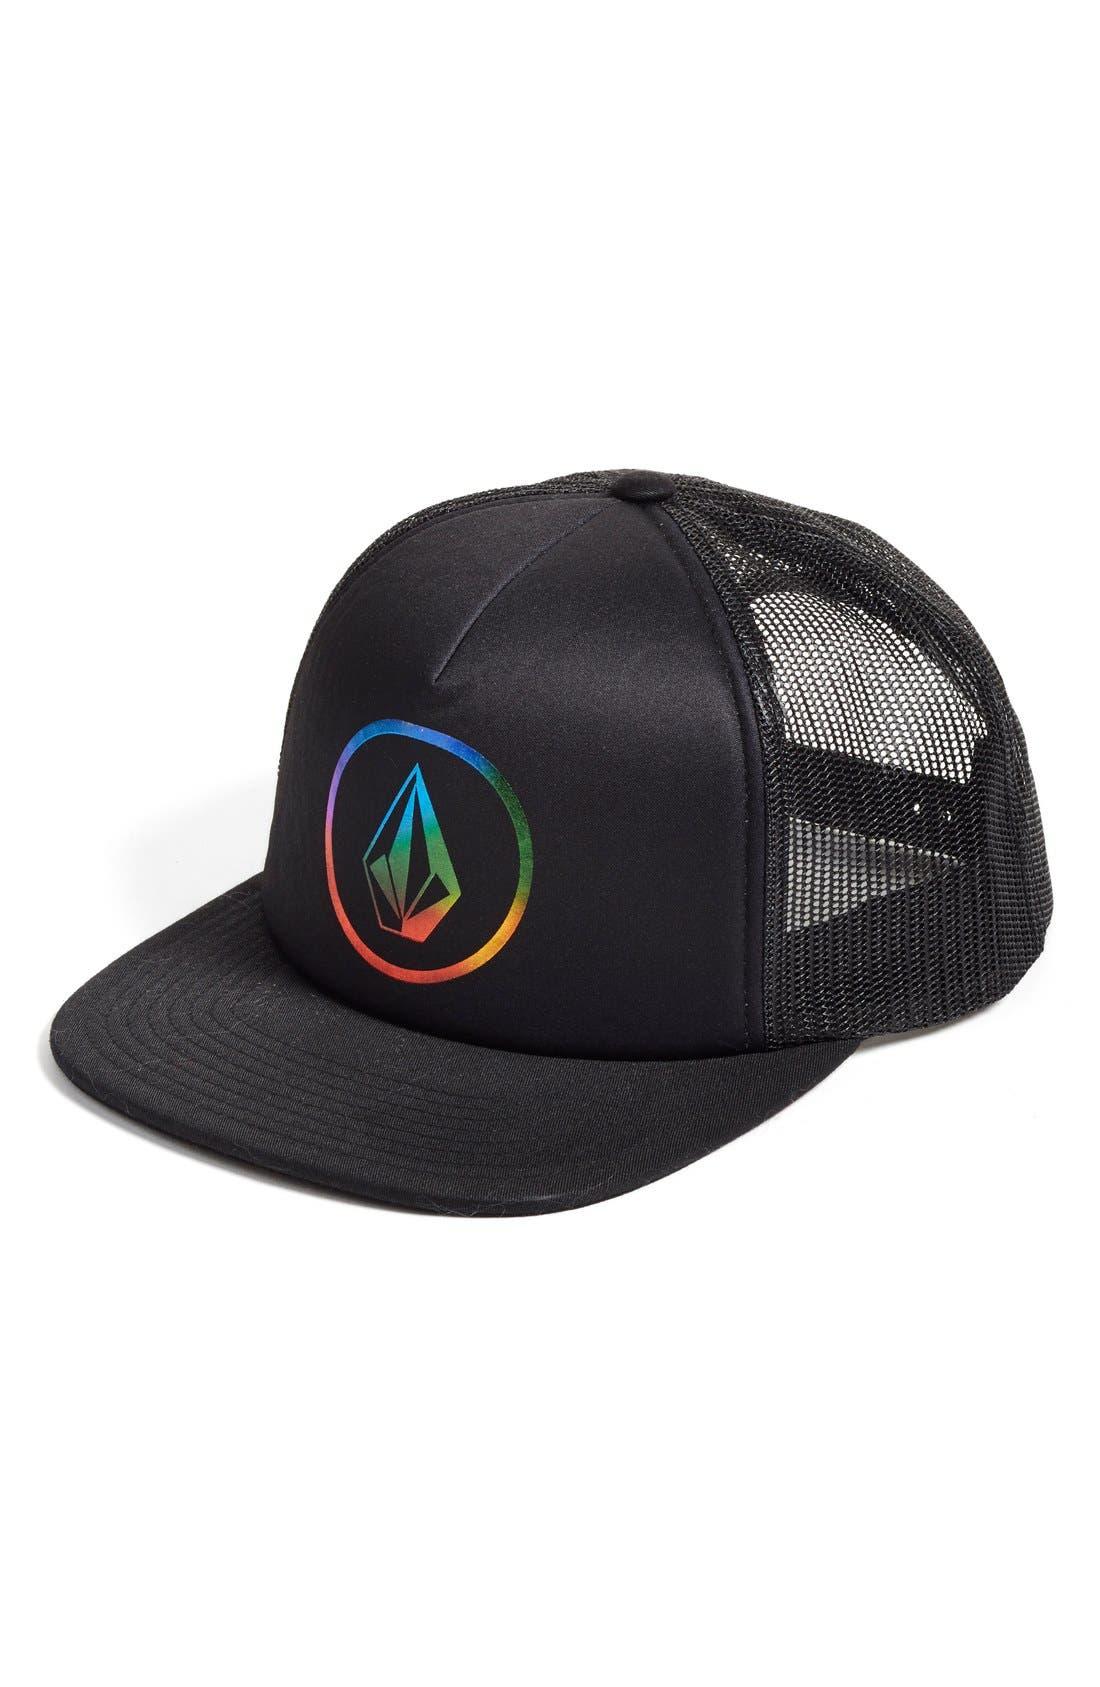 Alternate Image 1 Selected - Volcom 'Keep Truckin' Trucker Hat